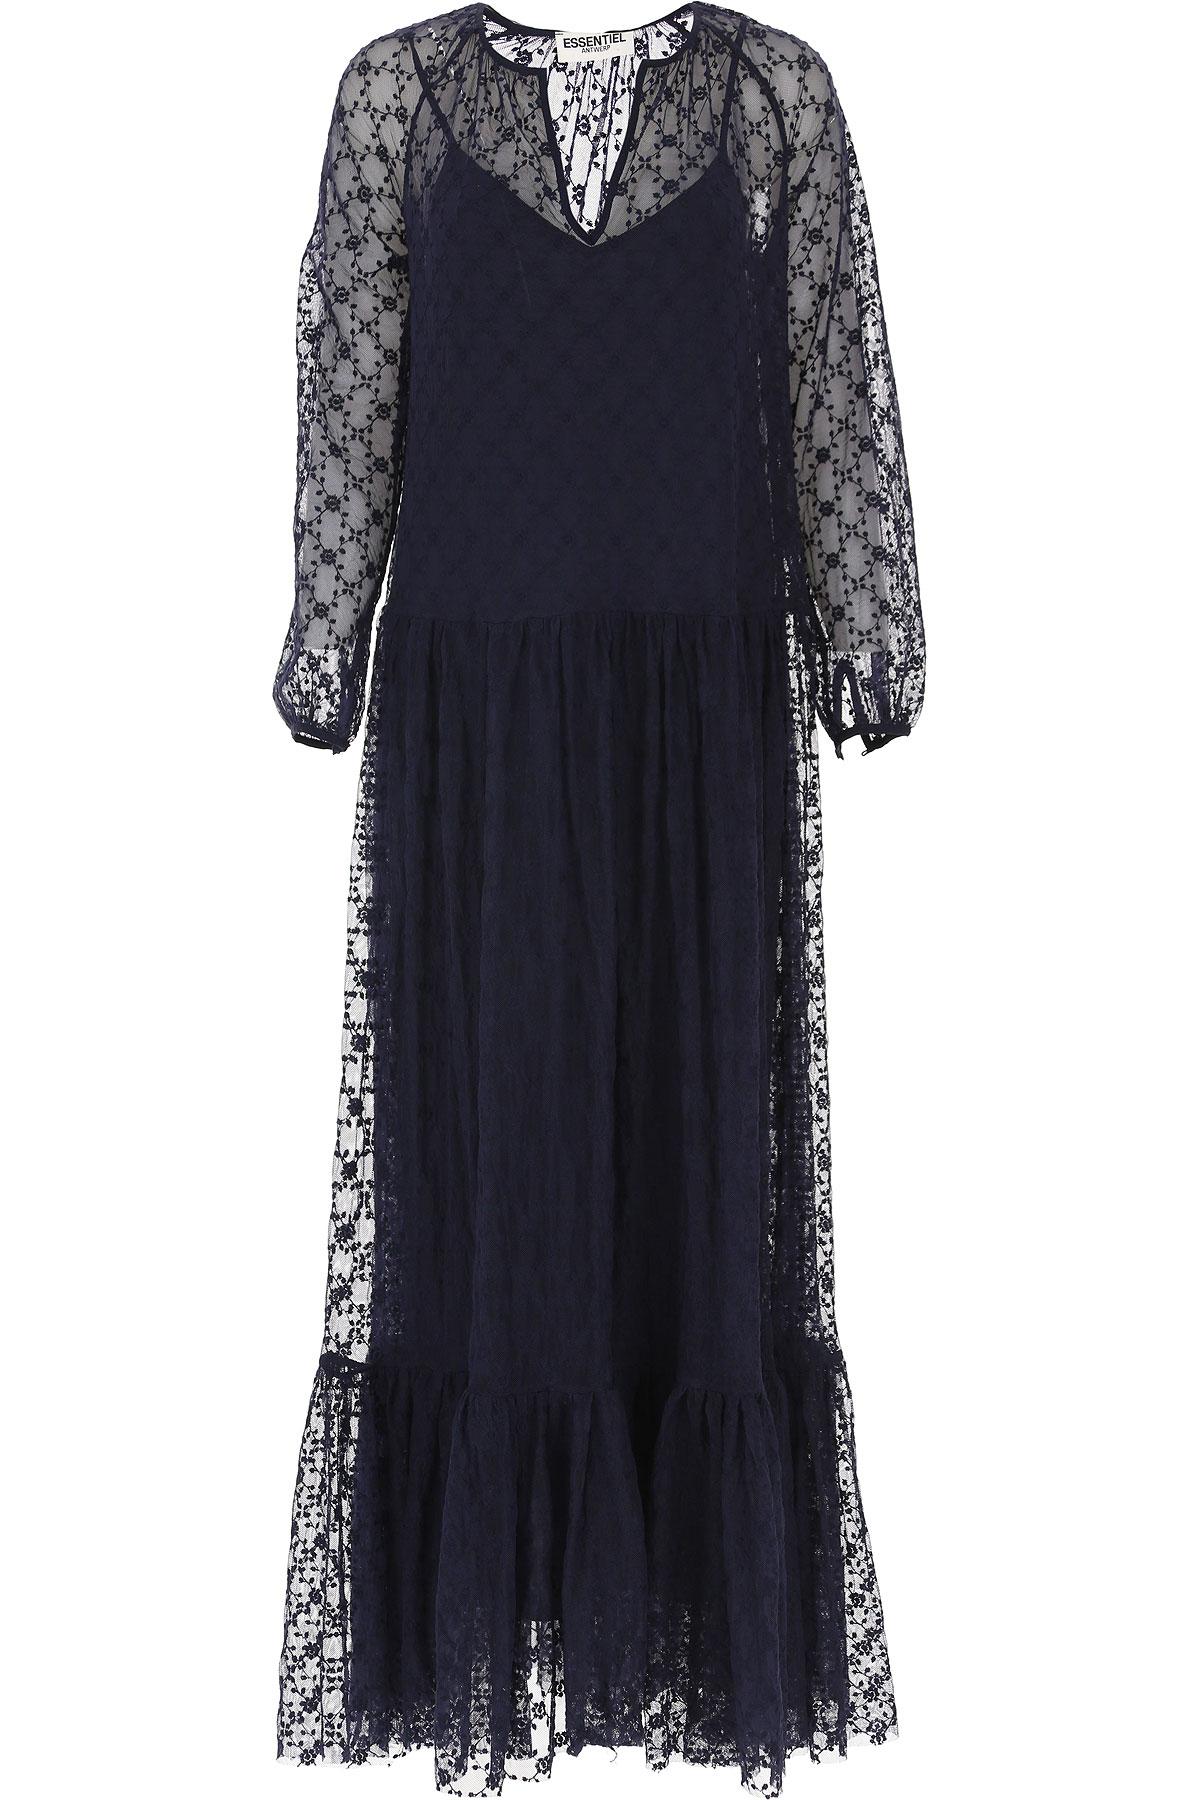 Image of ESSENTIEL Antwerp Dress for Women, Evening Cocktail Party, Blue, Nylon, 2017, 2 34